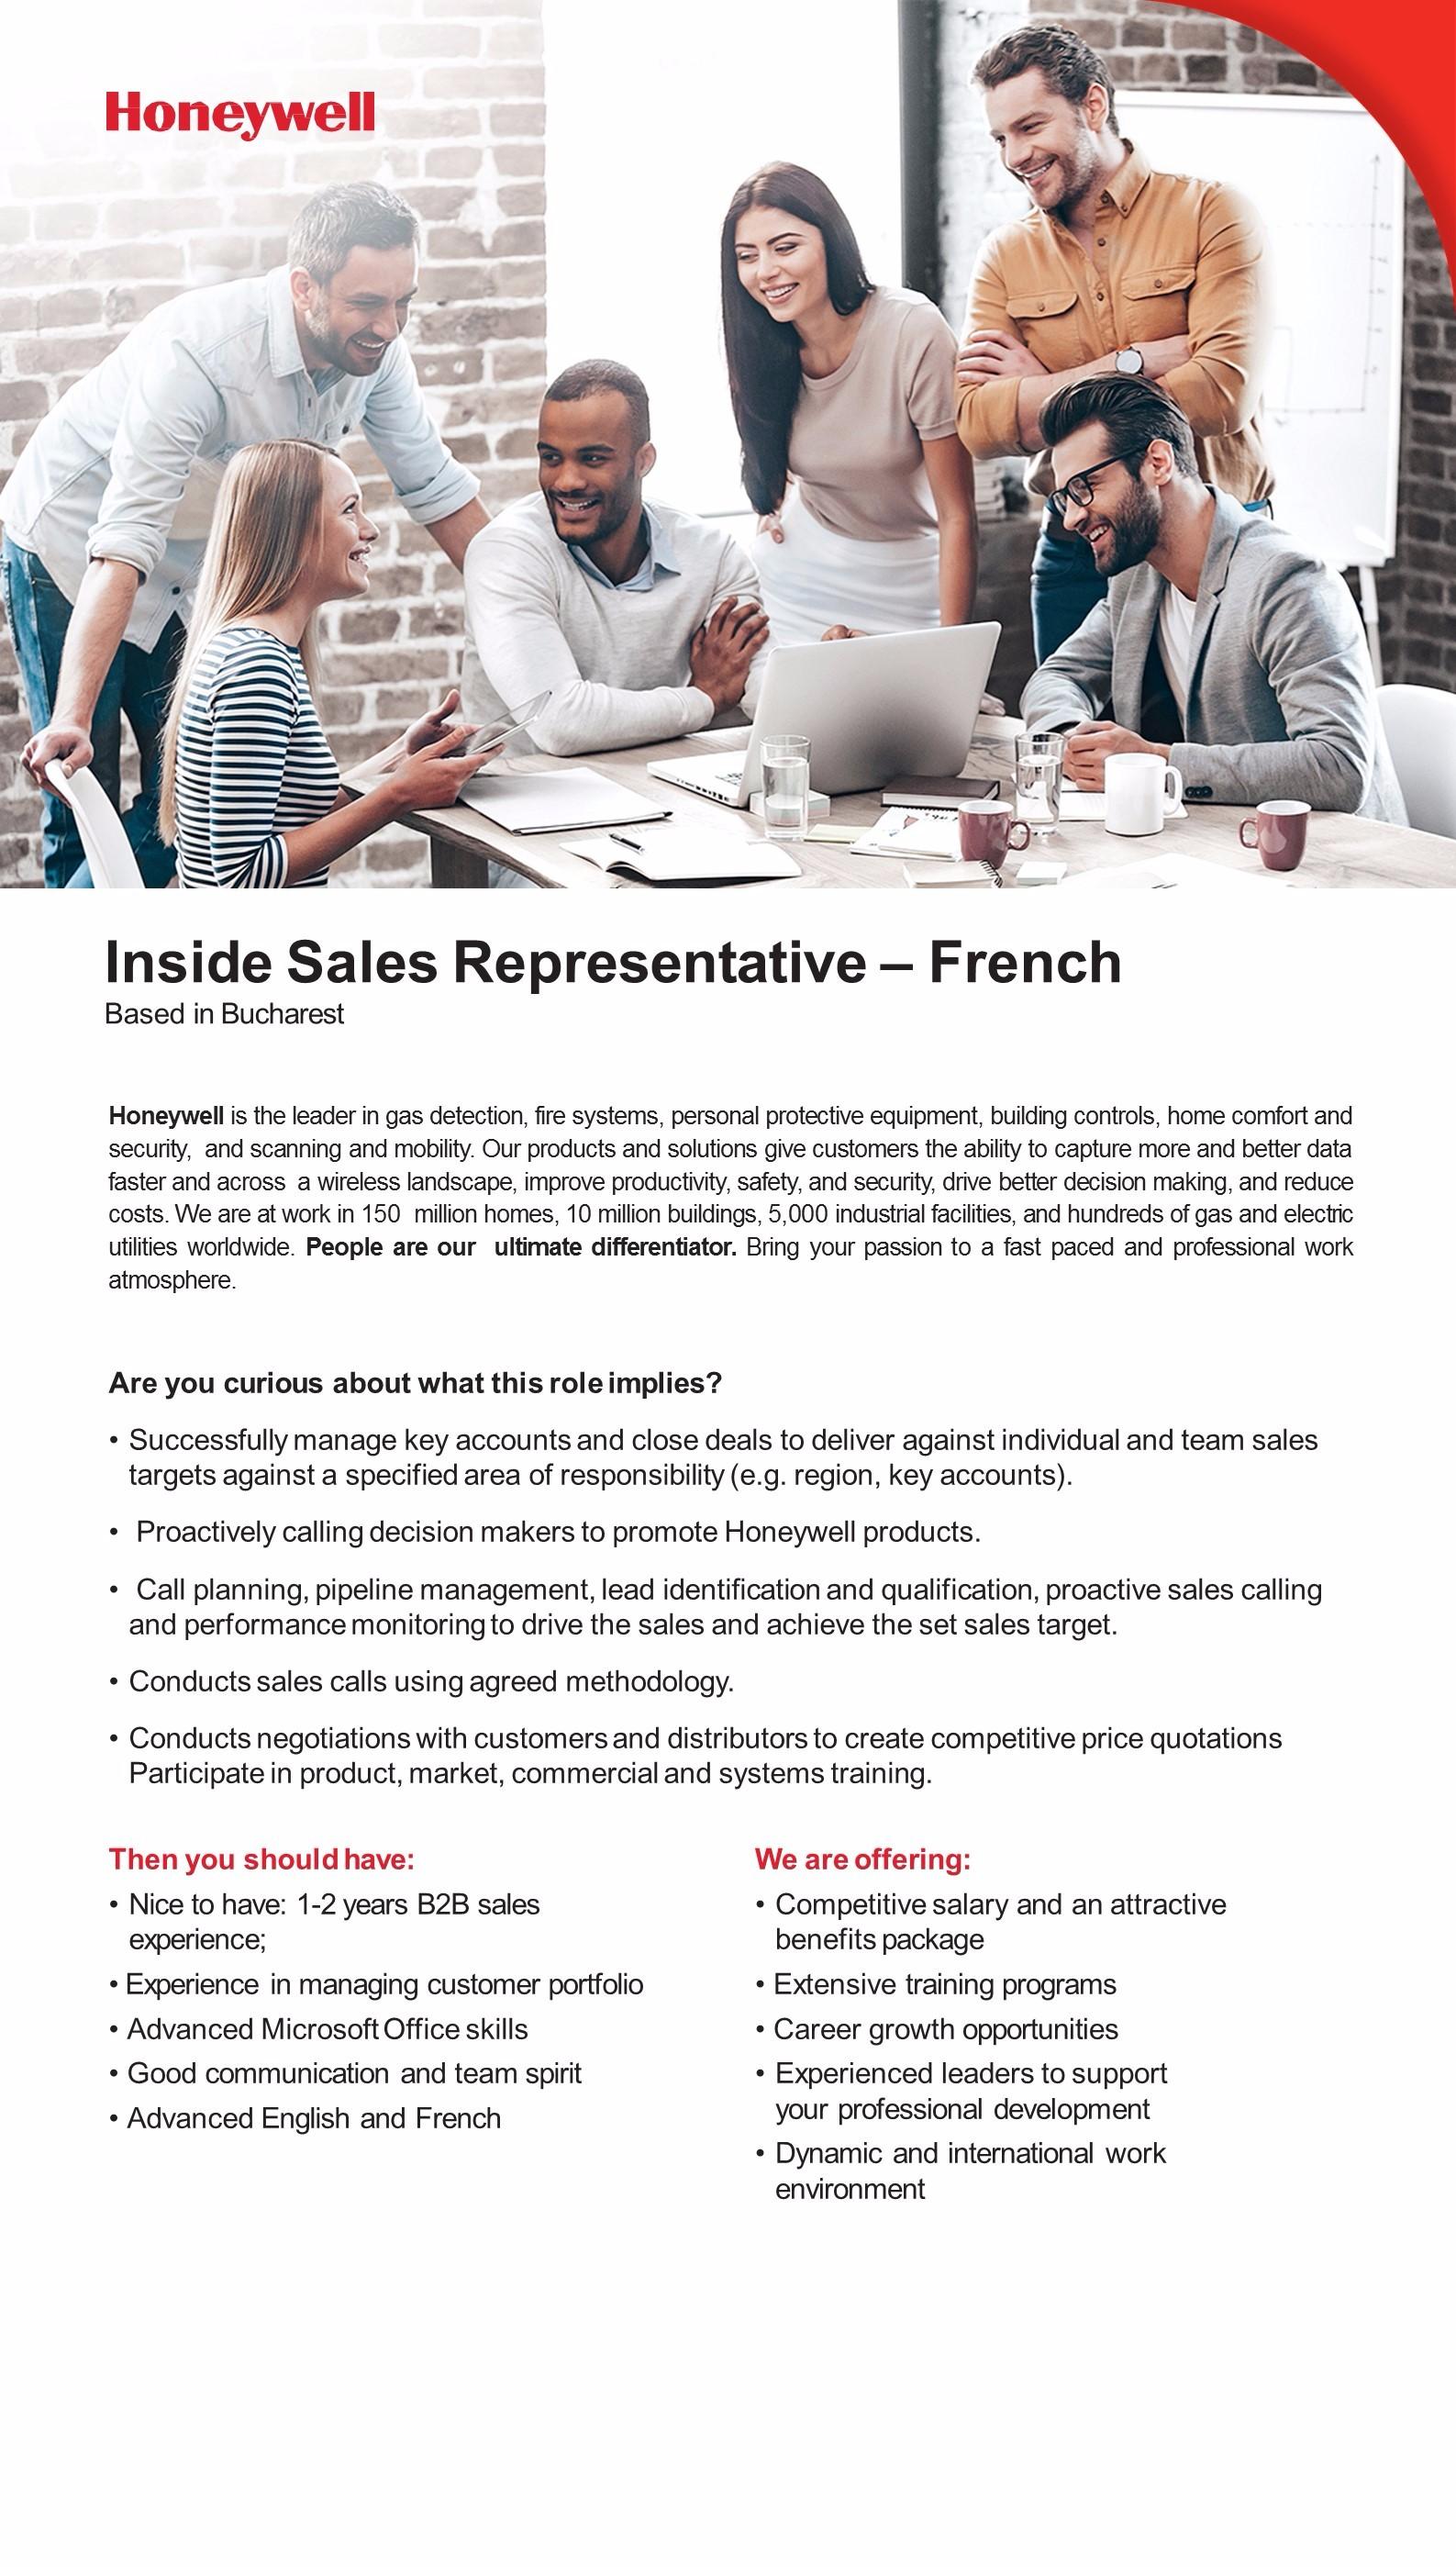 Inside Sales Representative - French JD